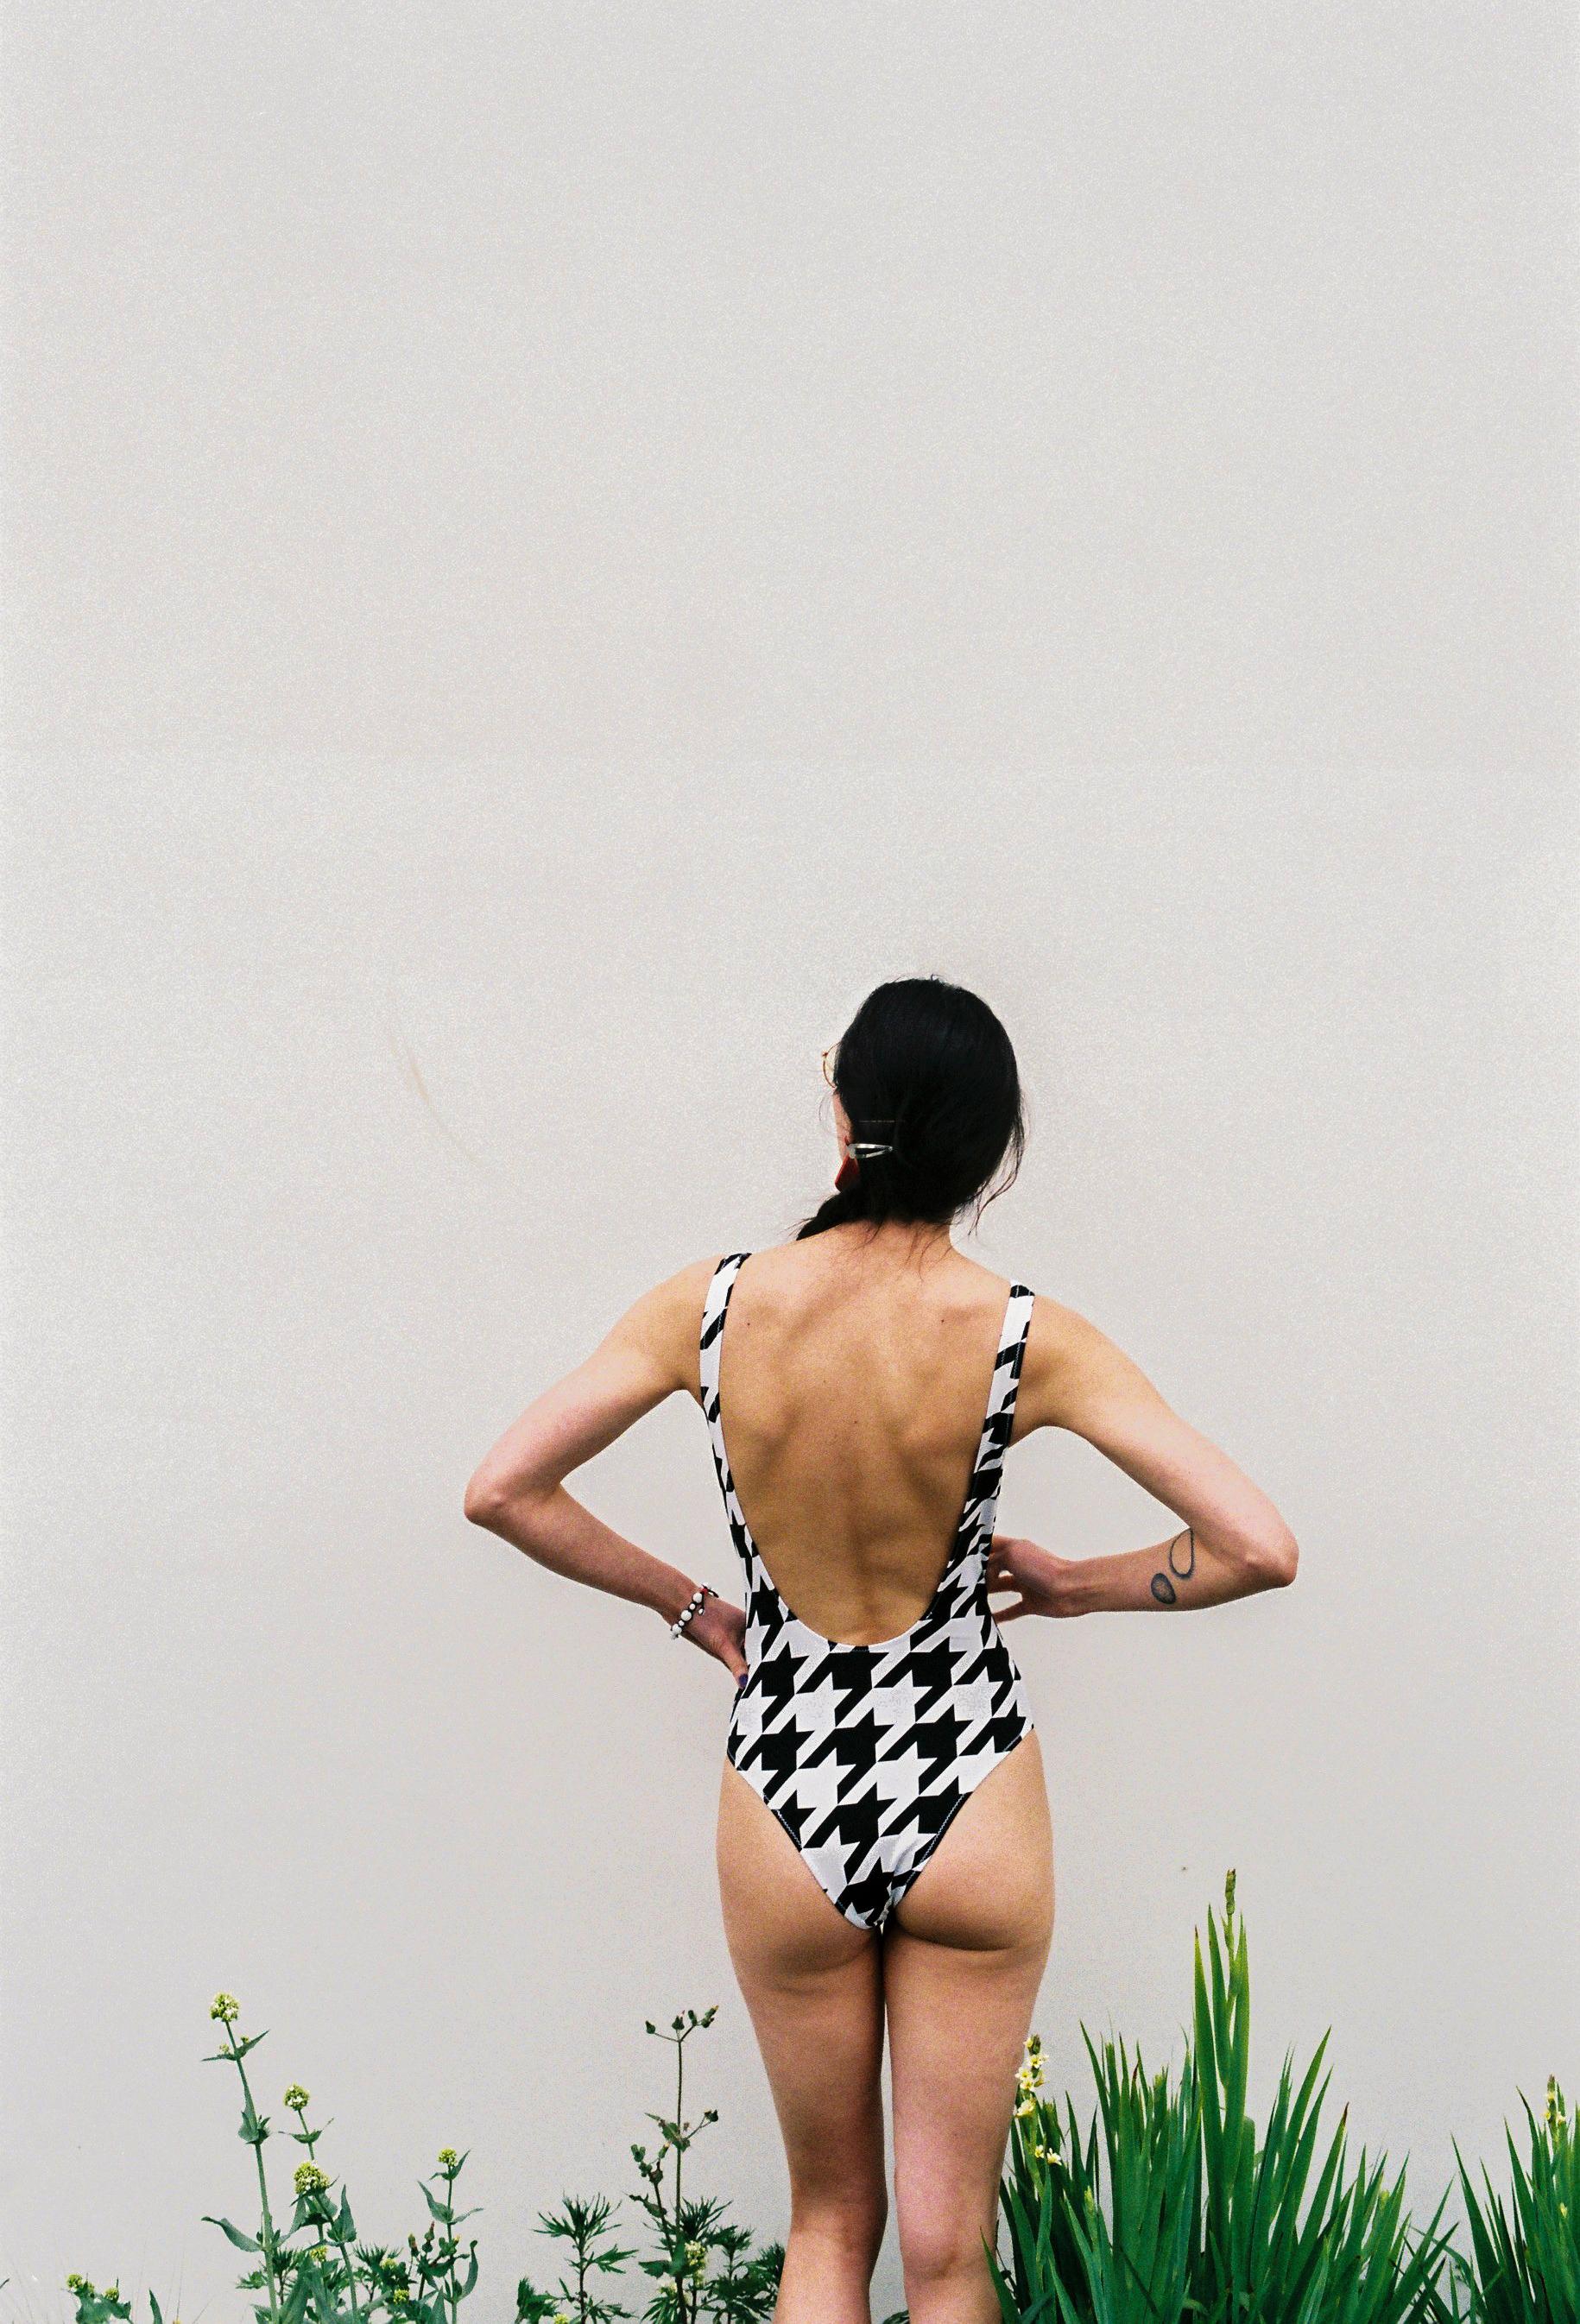 les rituelles edito maillots de bain swimwear vintage feel paris eshop lingerie_06.jpg